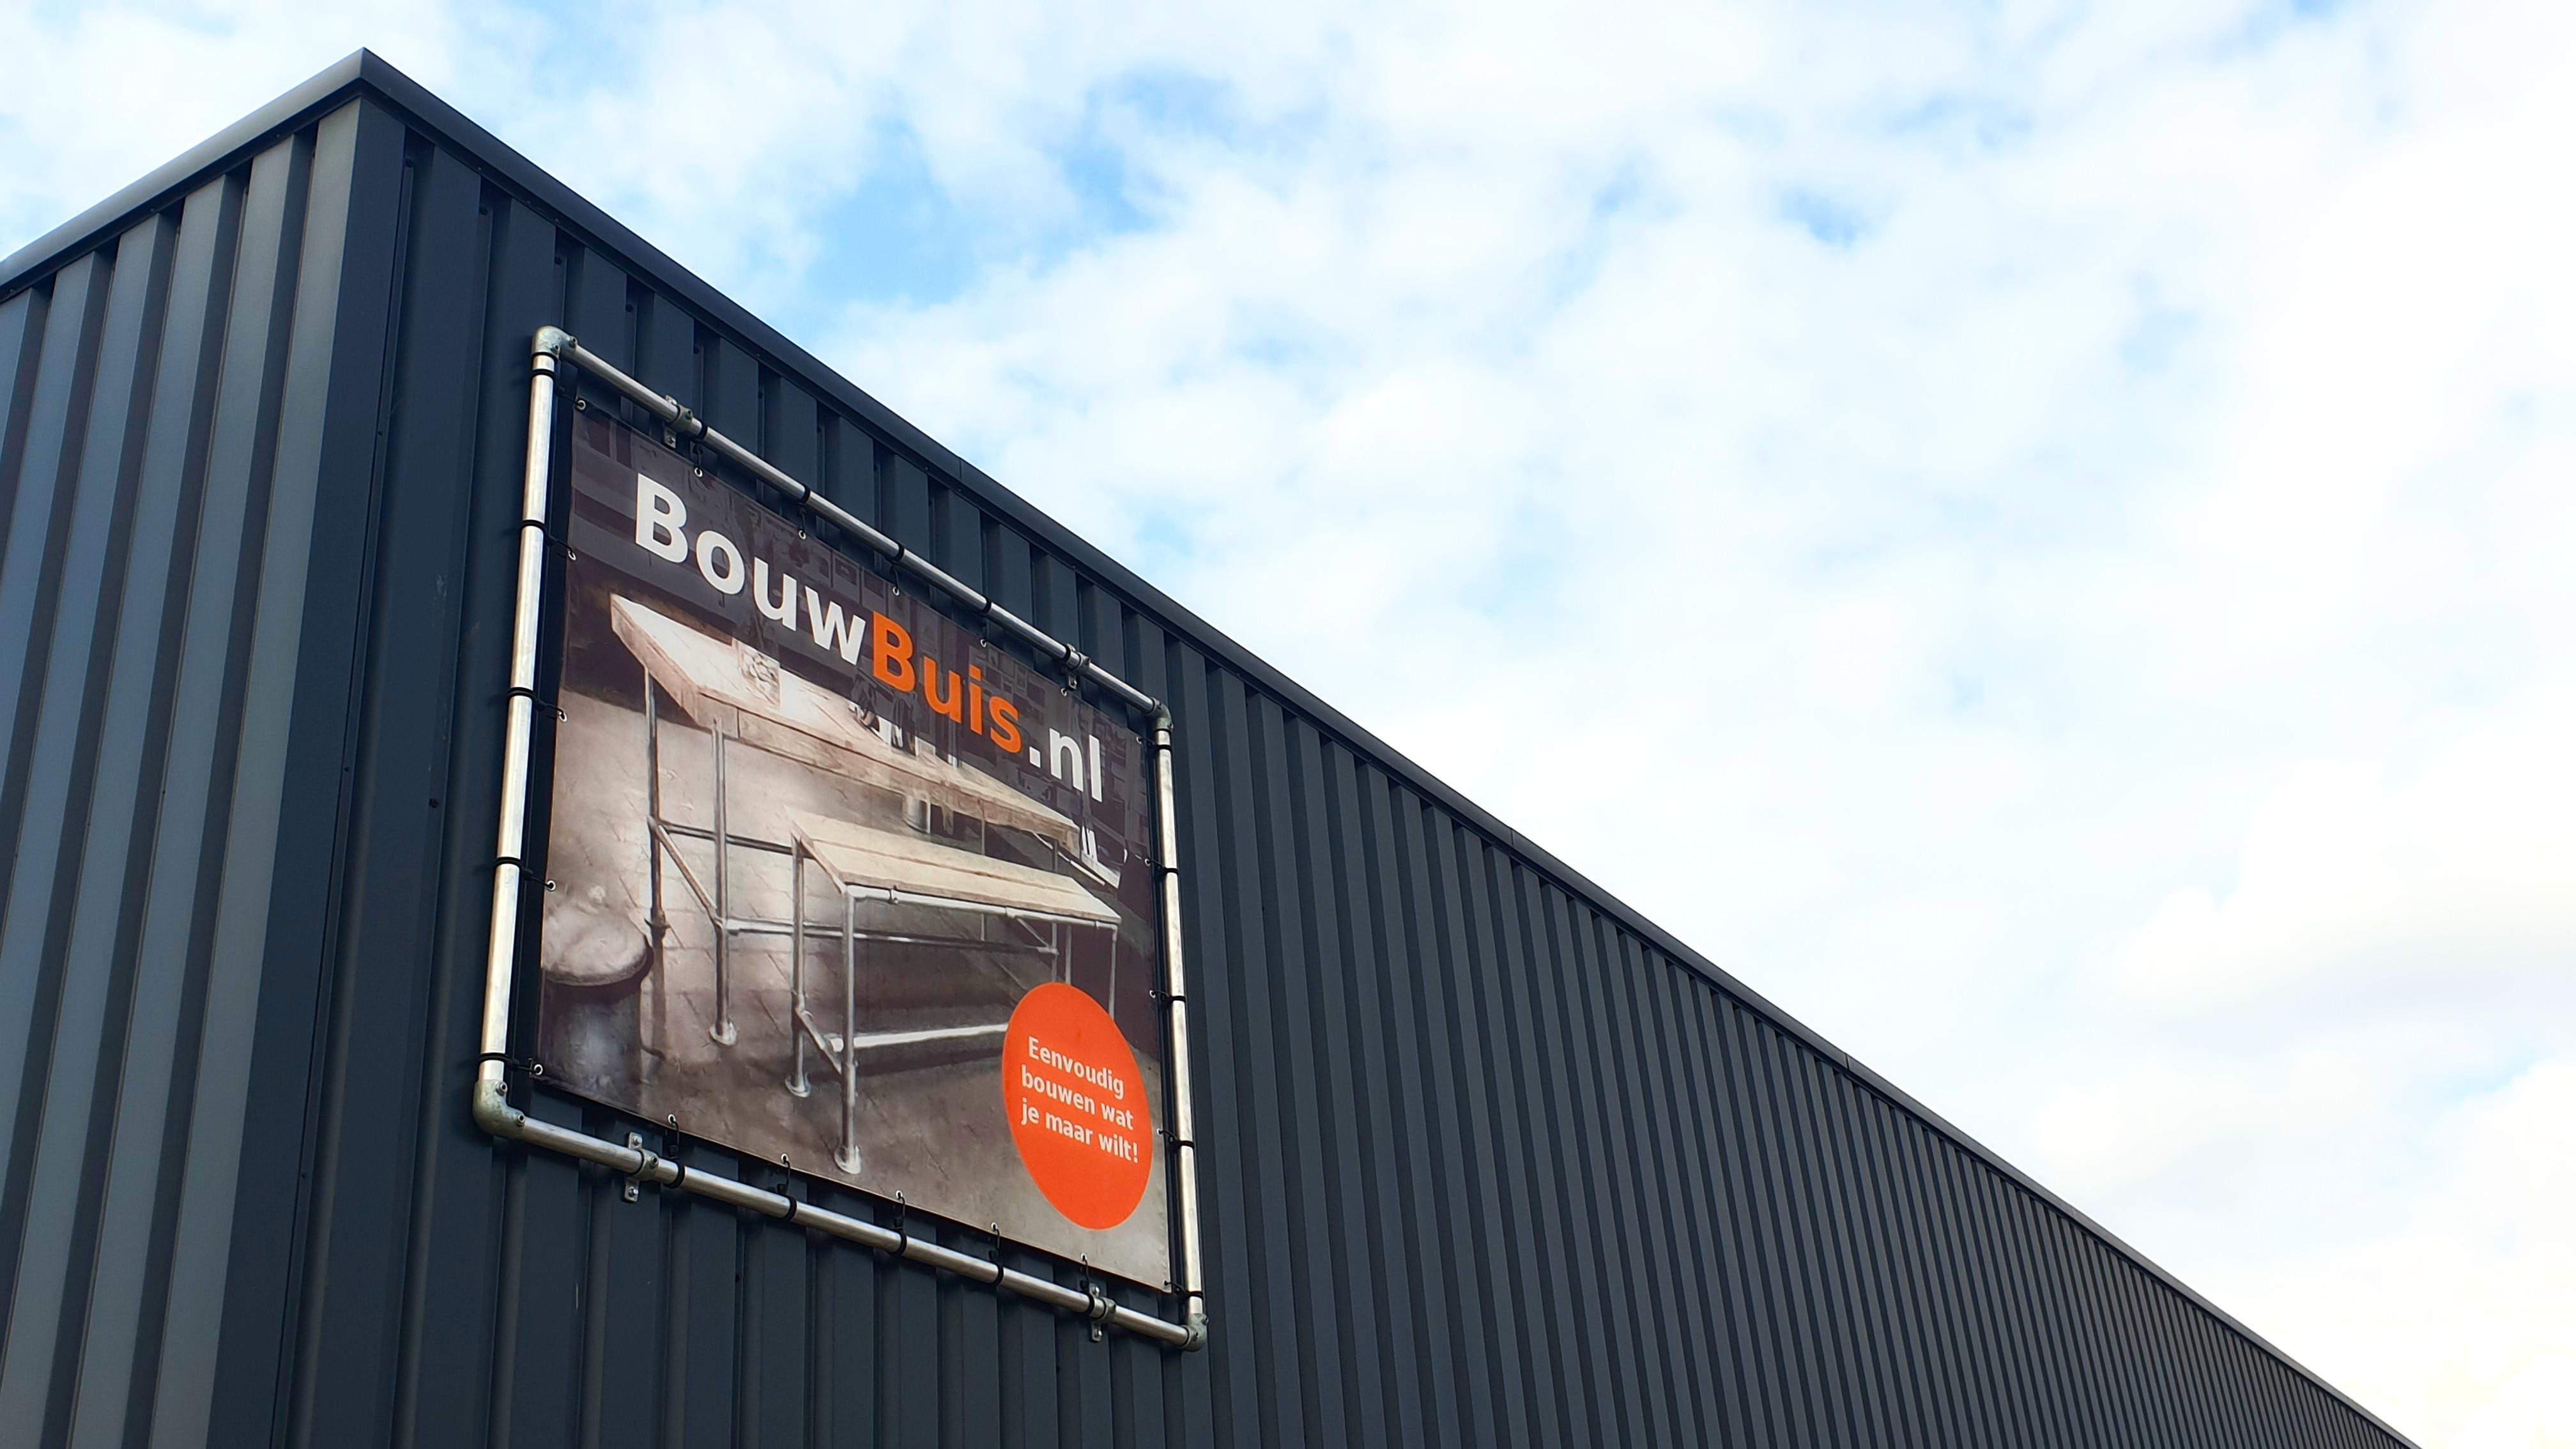 Bouwbuis-nl.jpg